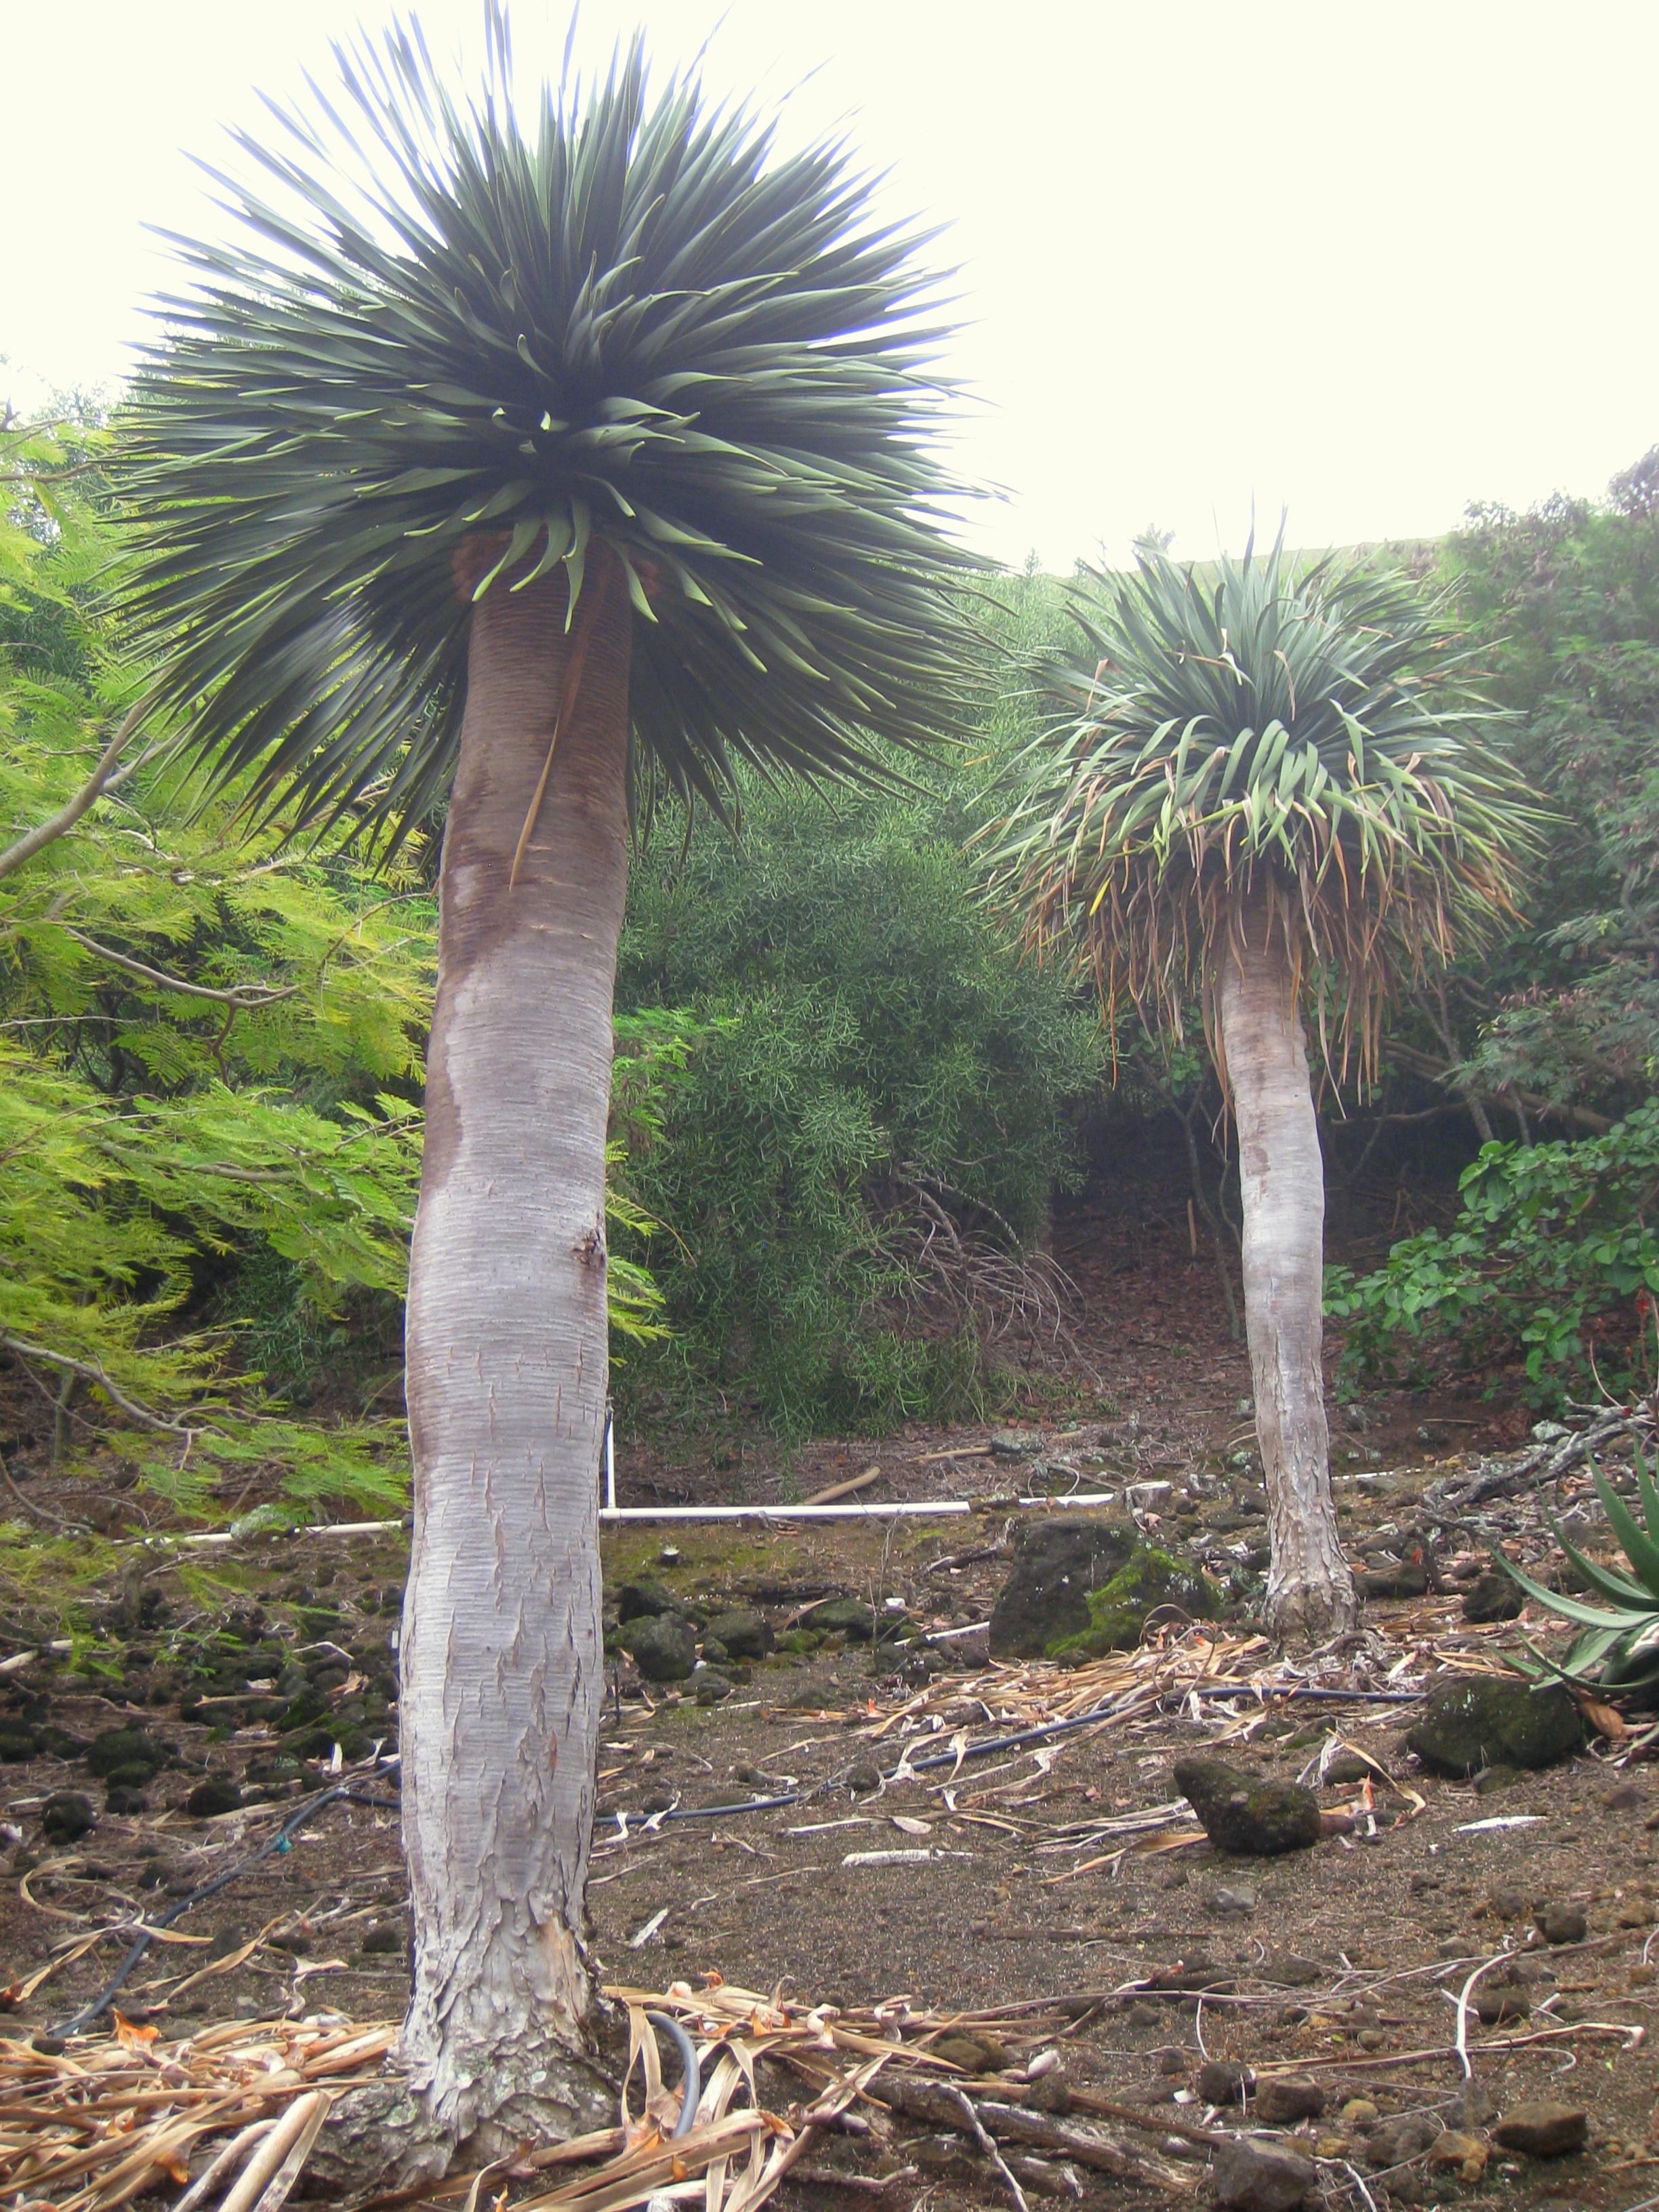 Dracaena cinnabari - Koko Crater Botanical Garden 栽於夏威夷可可火山口植物園(Koko Crater Botanical Garden)的索科特拉龍血樹。